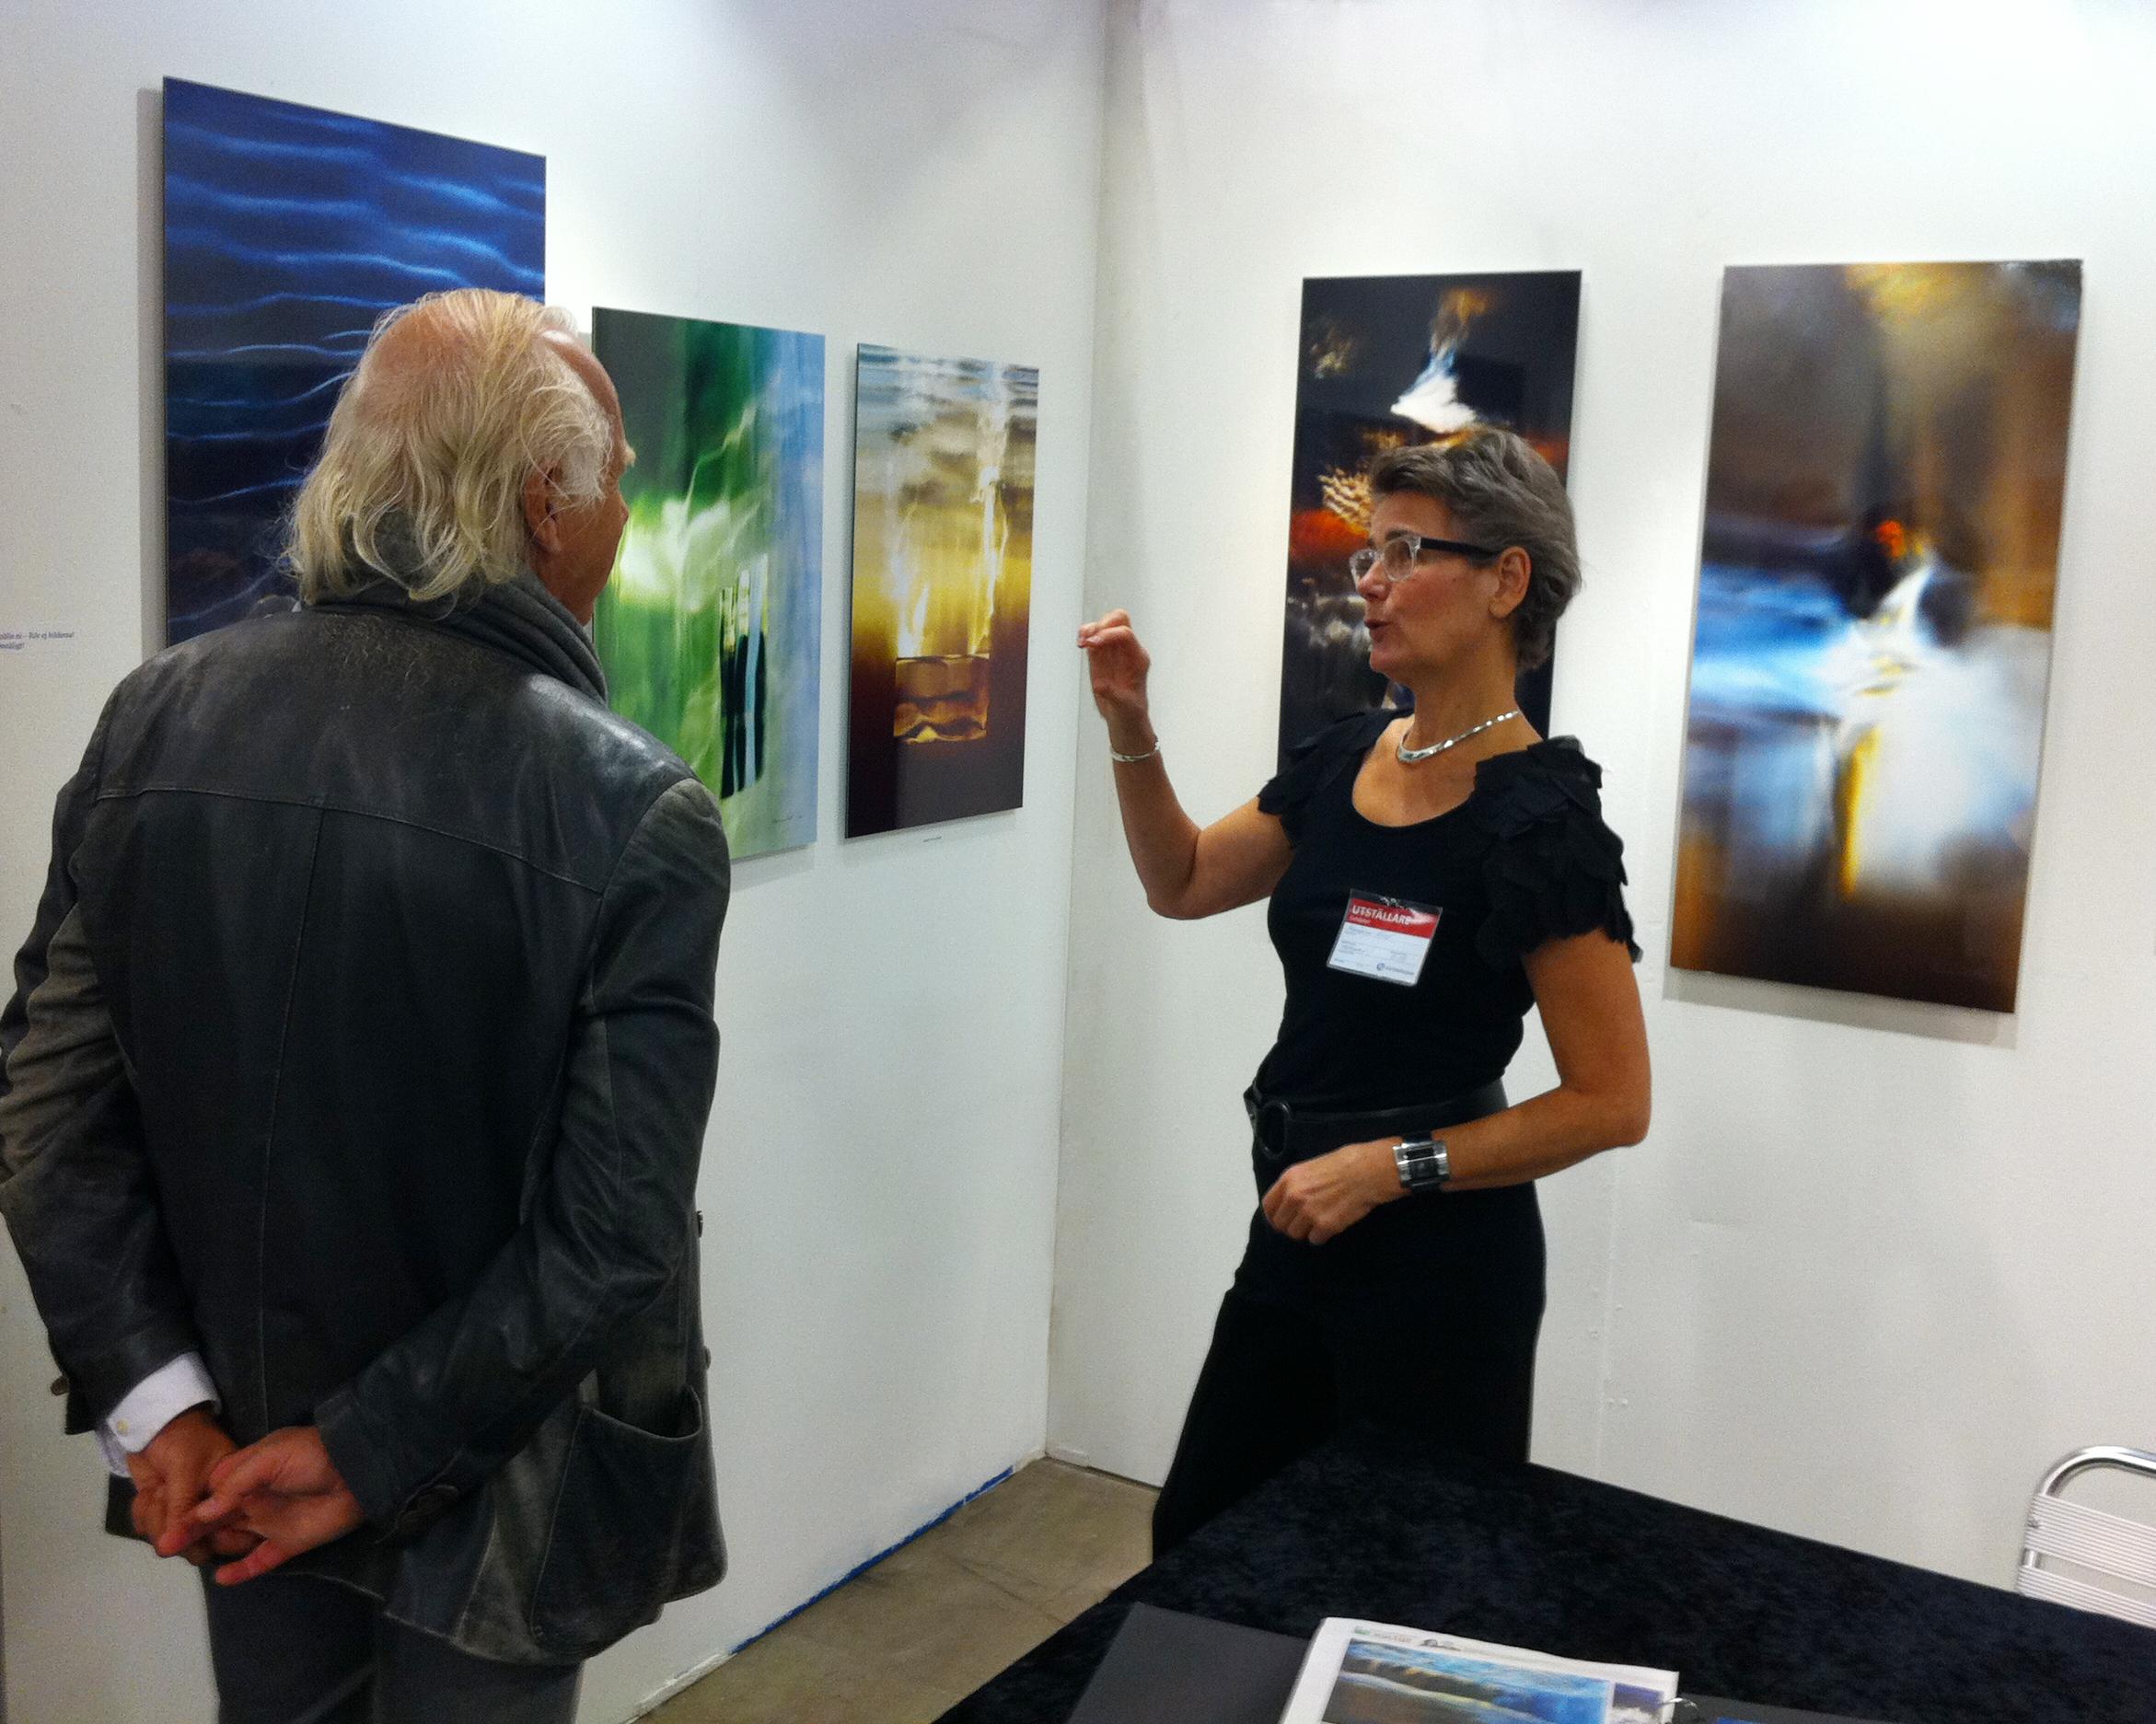 Kista Art Fair 2011